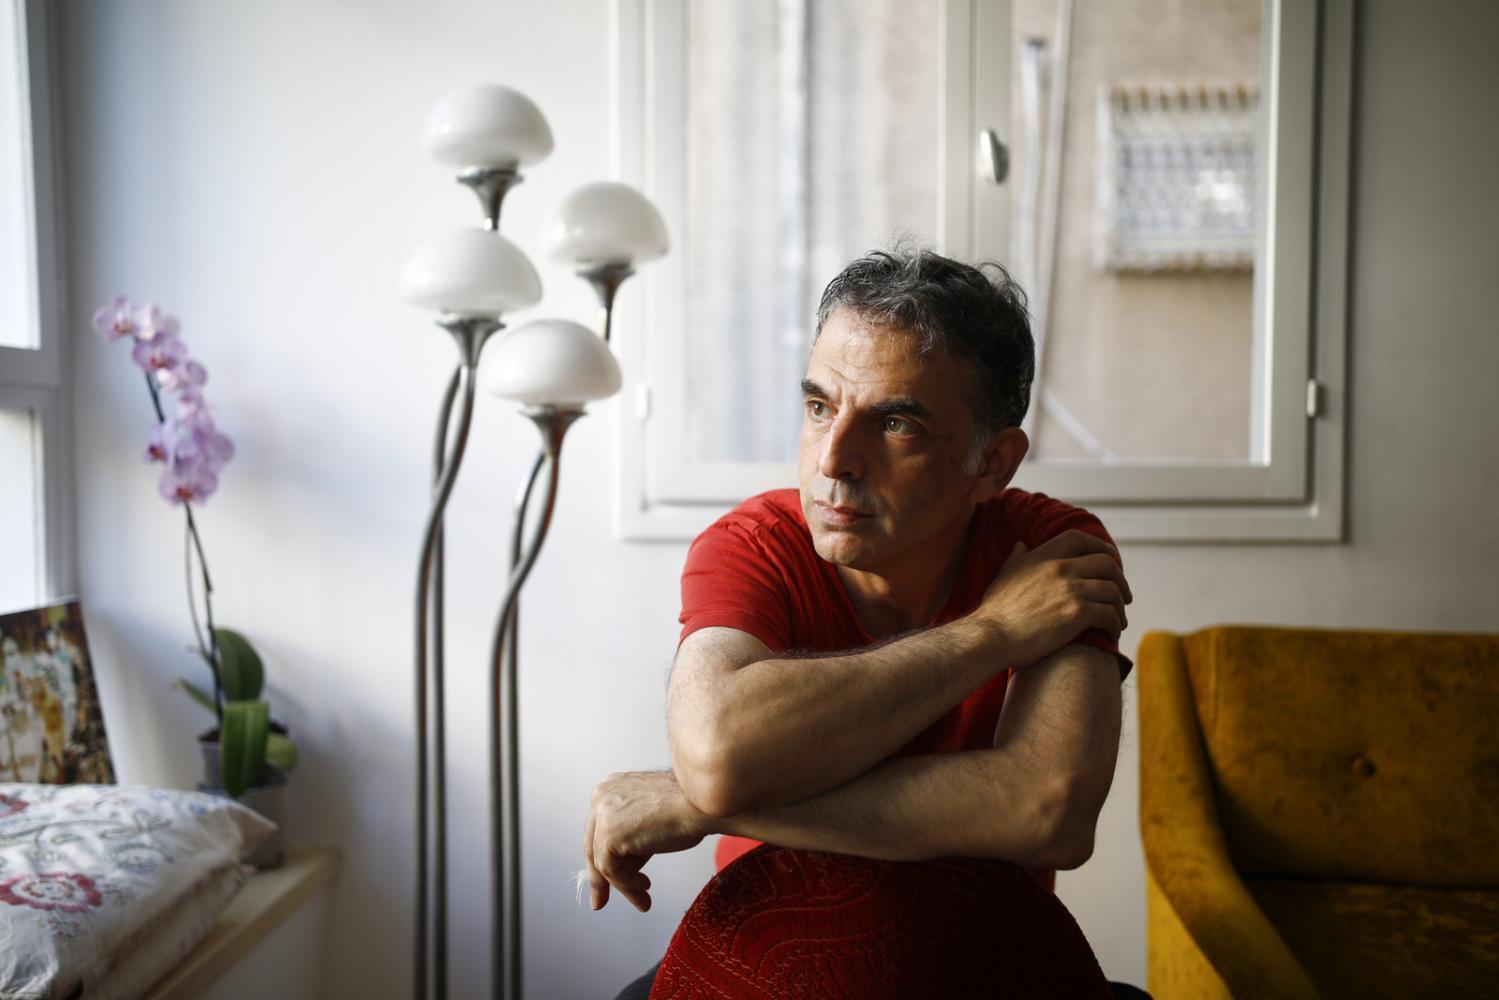 TEL AVIV, ISRAEL - AUGUST 15, 2019: Portrait of Israeli writer Etgar Keret in his home in Tel Aviv, Israel. CREDIT: Corinna Kern for The New York Times